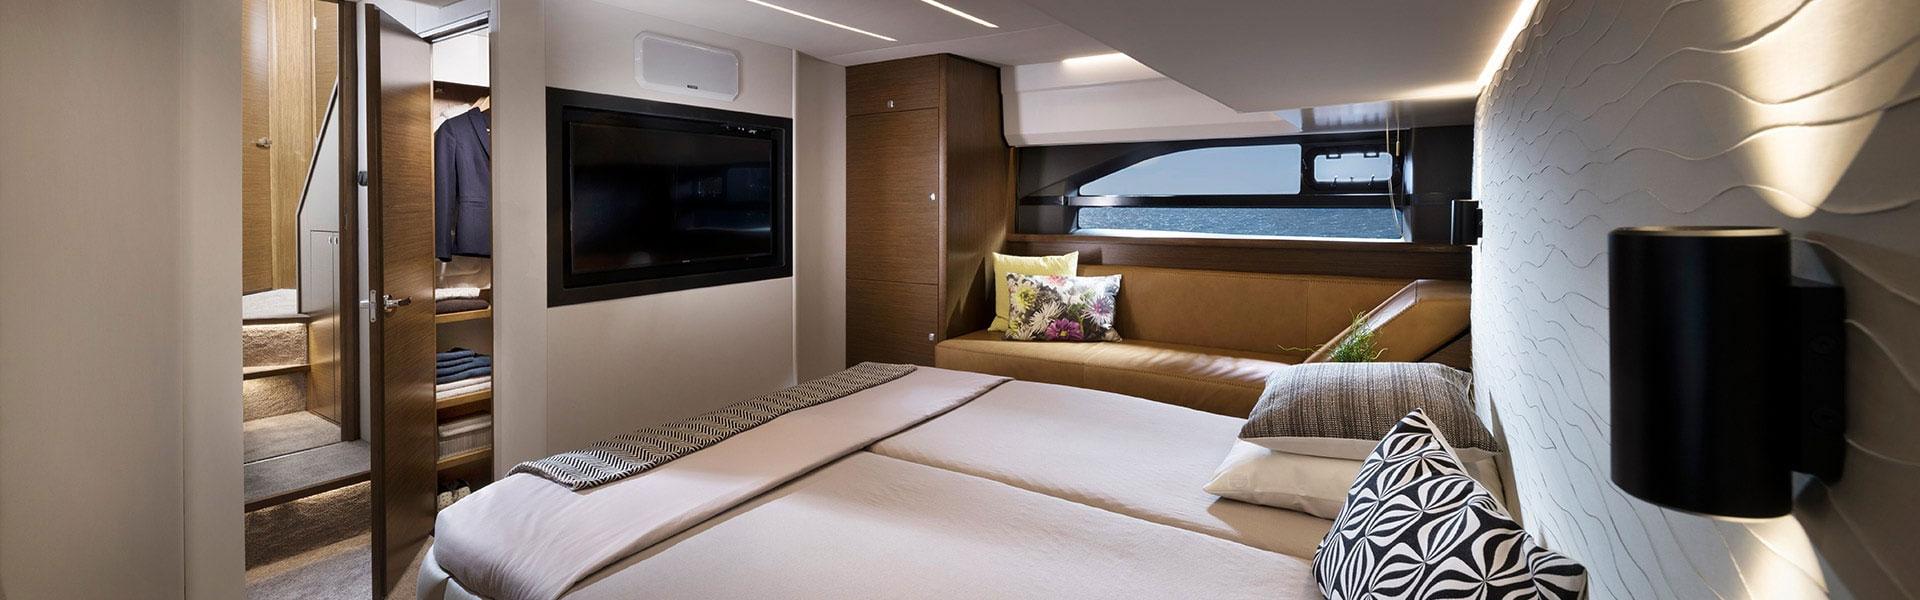 Bavaria Yachts R55 Master Cabin